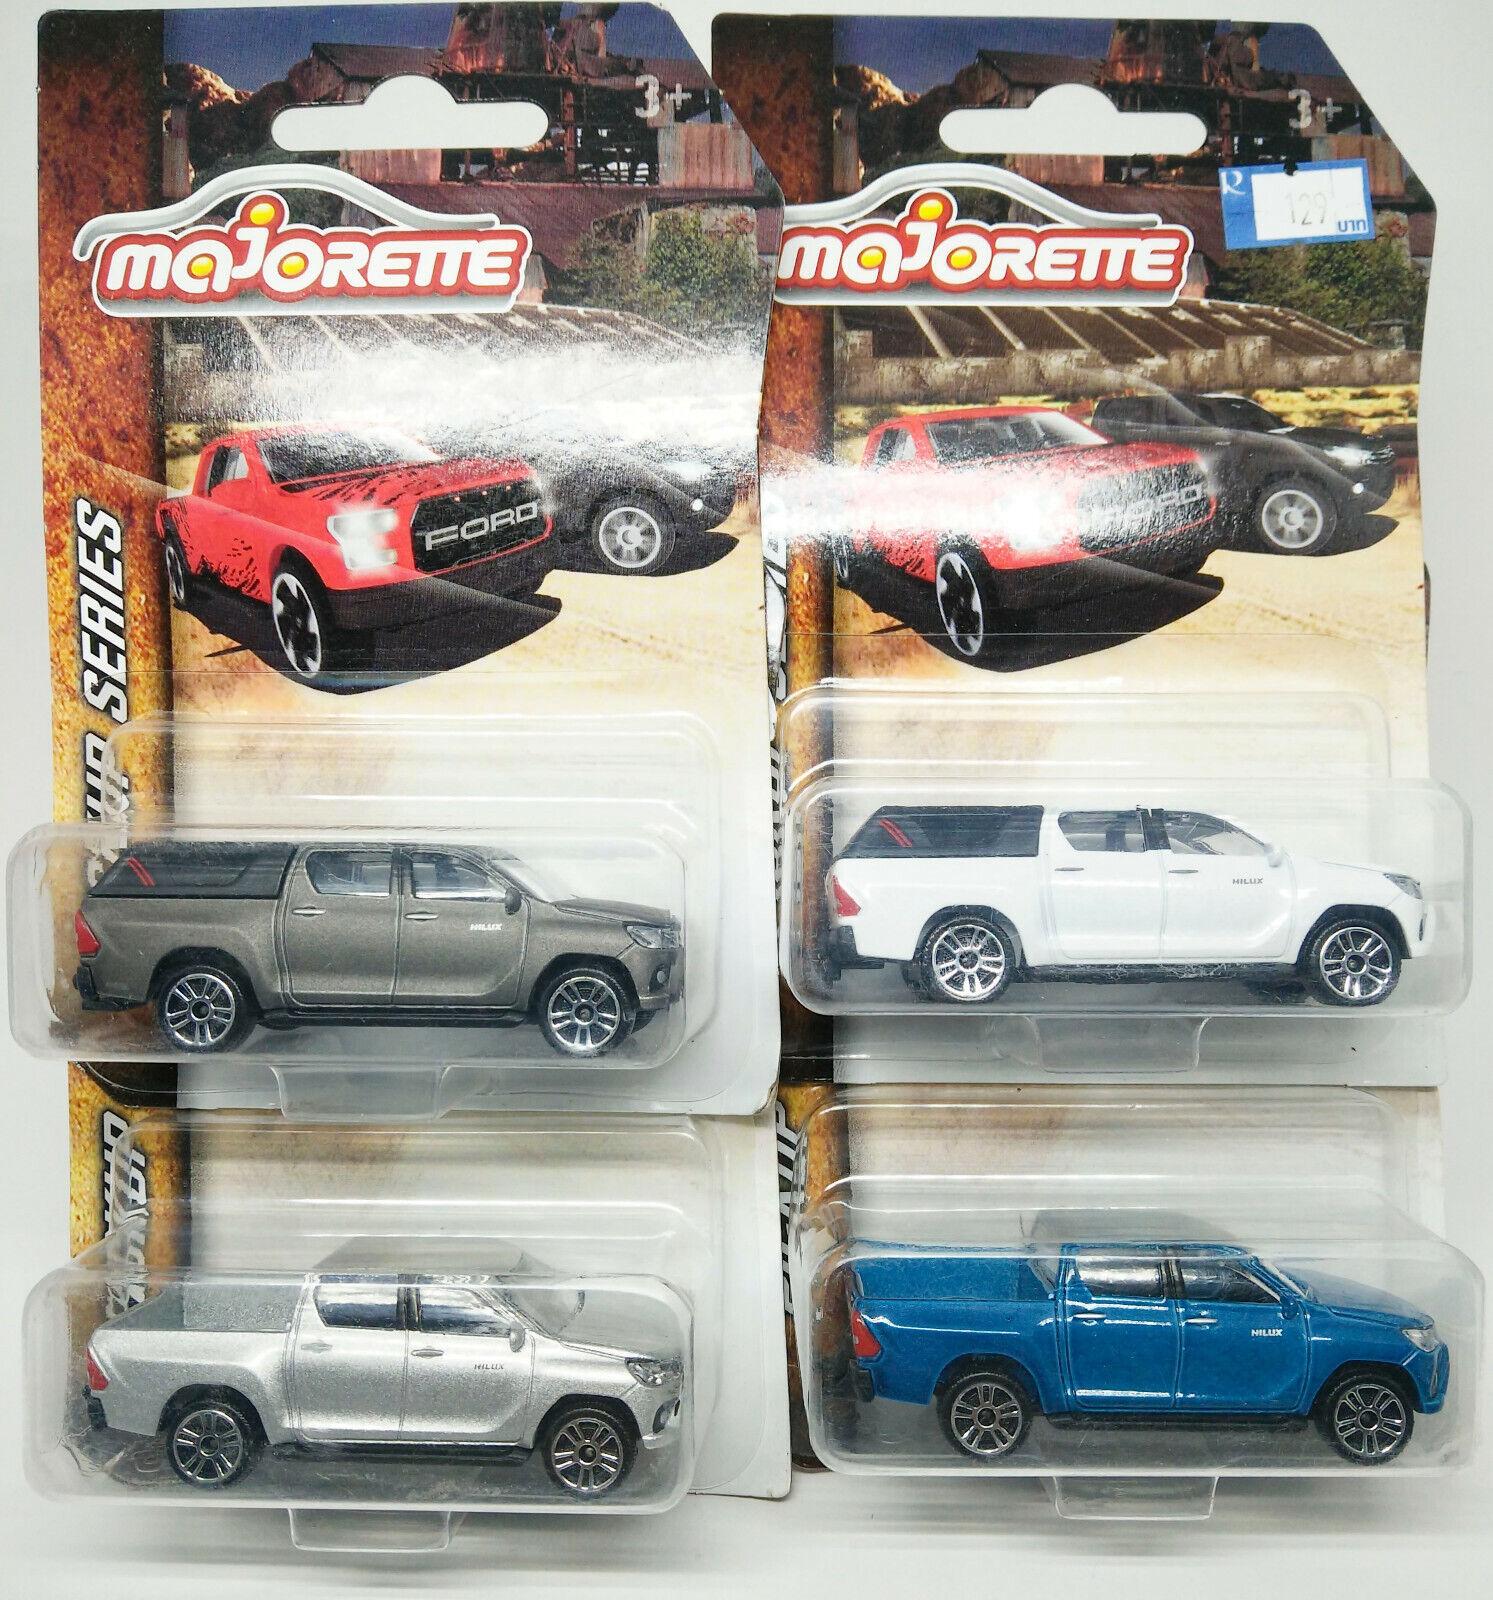 Majorette Toyota Hilux Revo Set of 4 colors White, Grey, Silver, bluee Scale 1 58